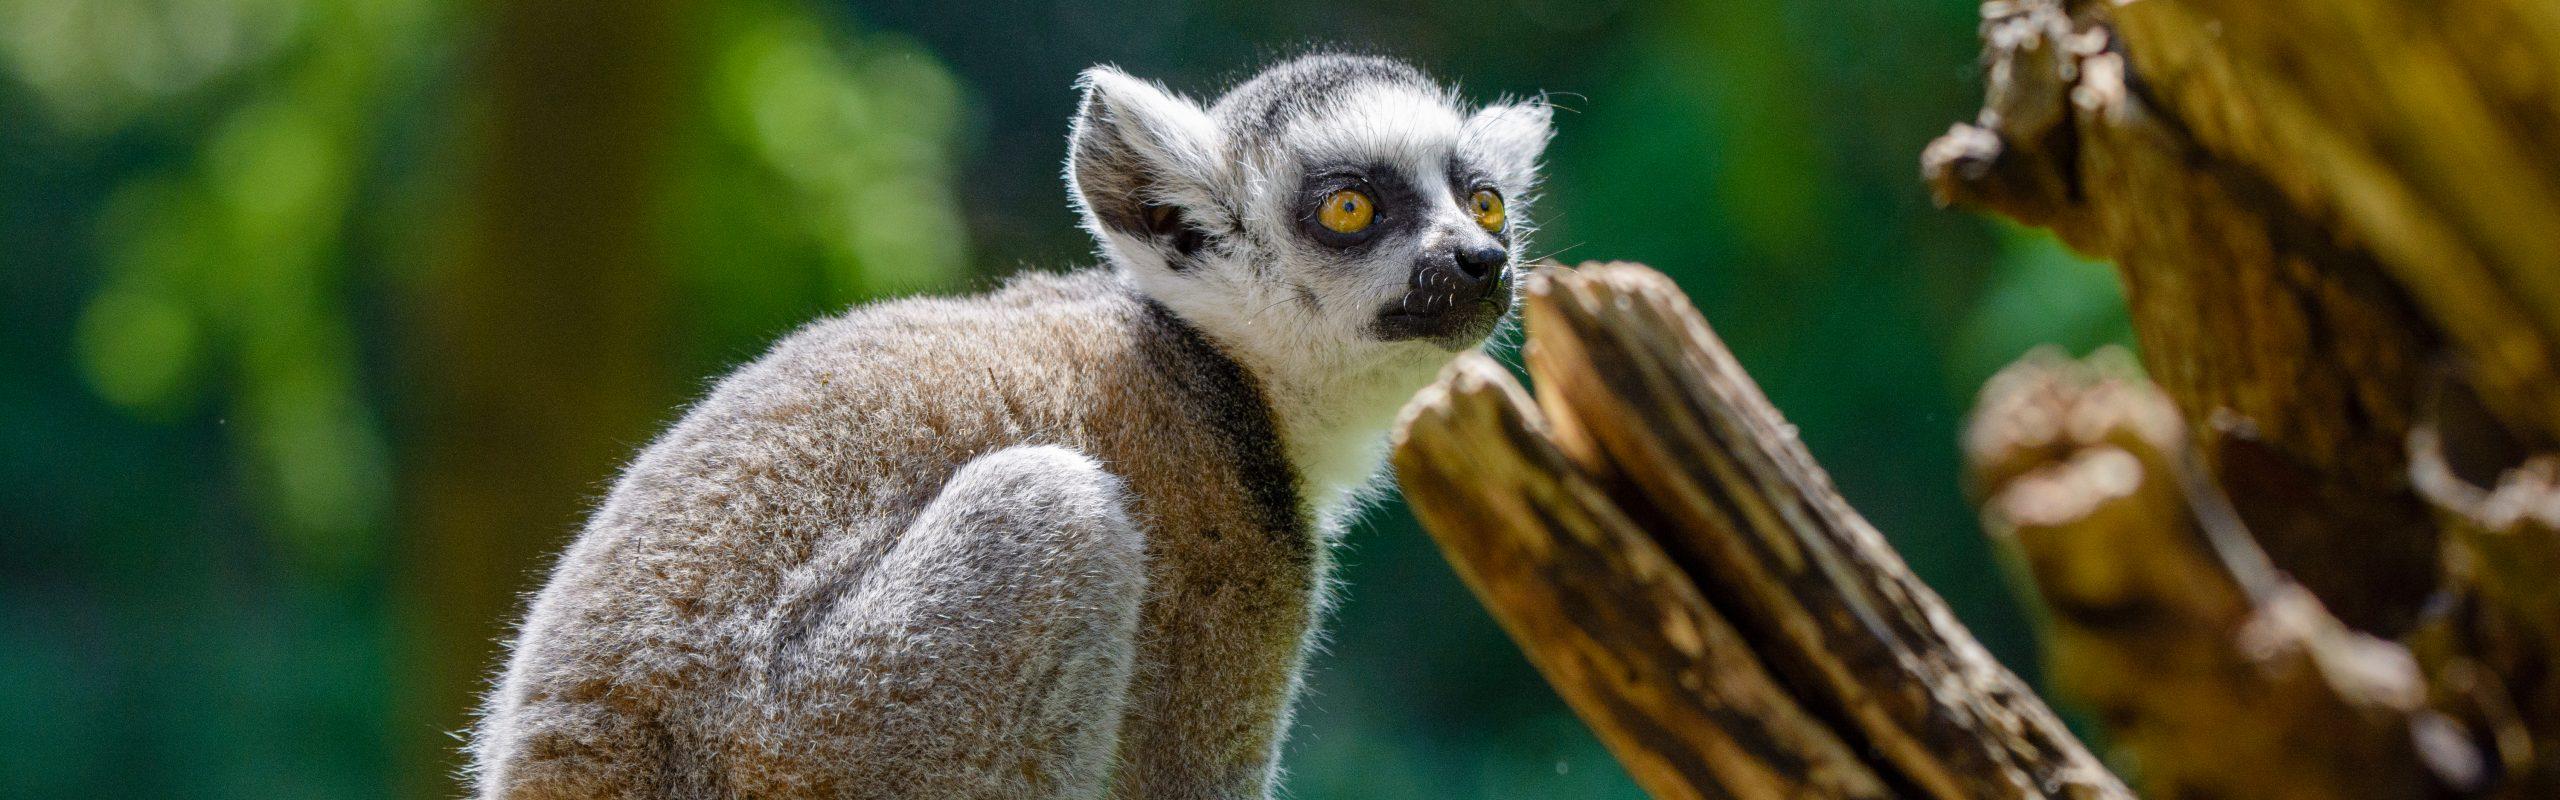 https://faunafocus.com/home/november-2018-ring-tailed-lemur/#jp-carousel-11931